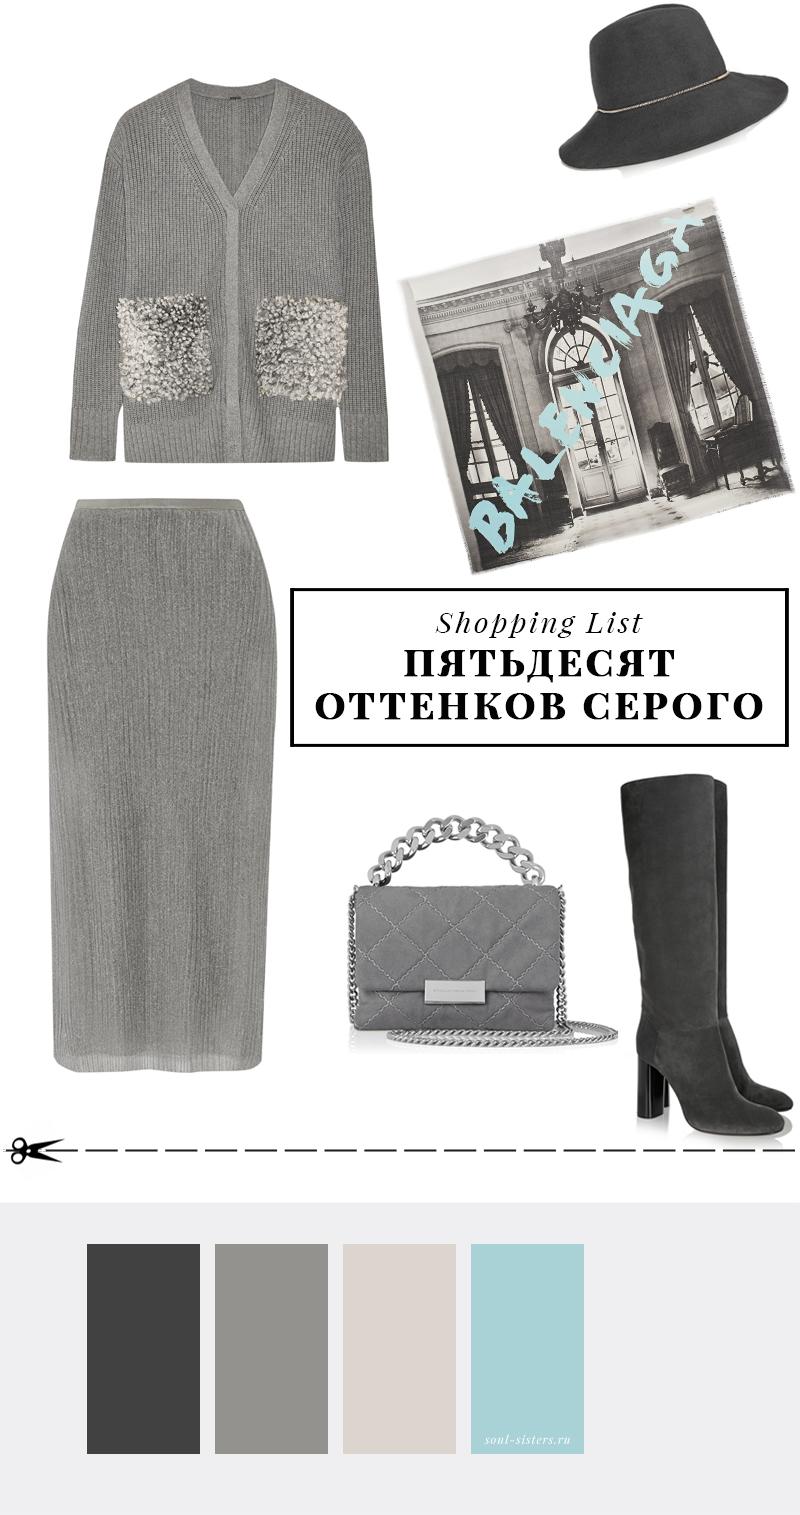 Shopping List_50 оттенков серого_